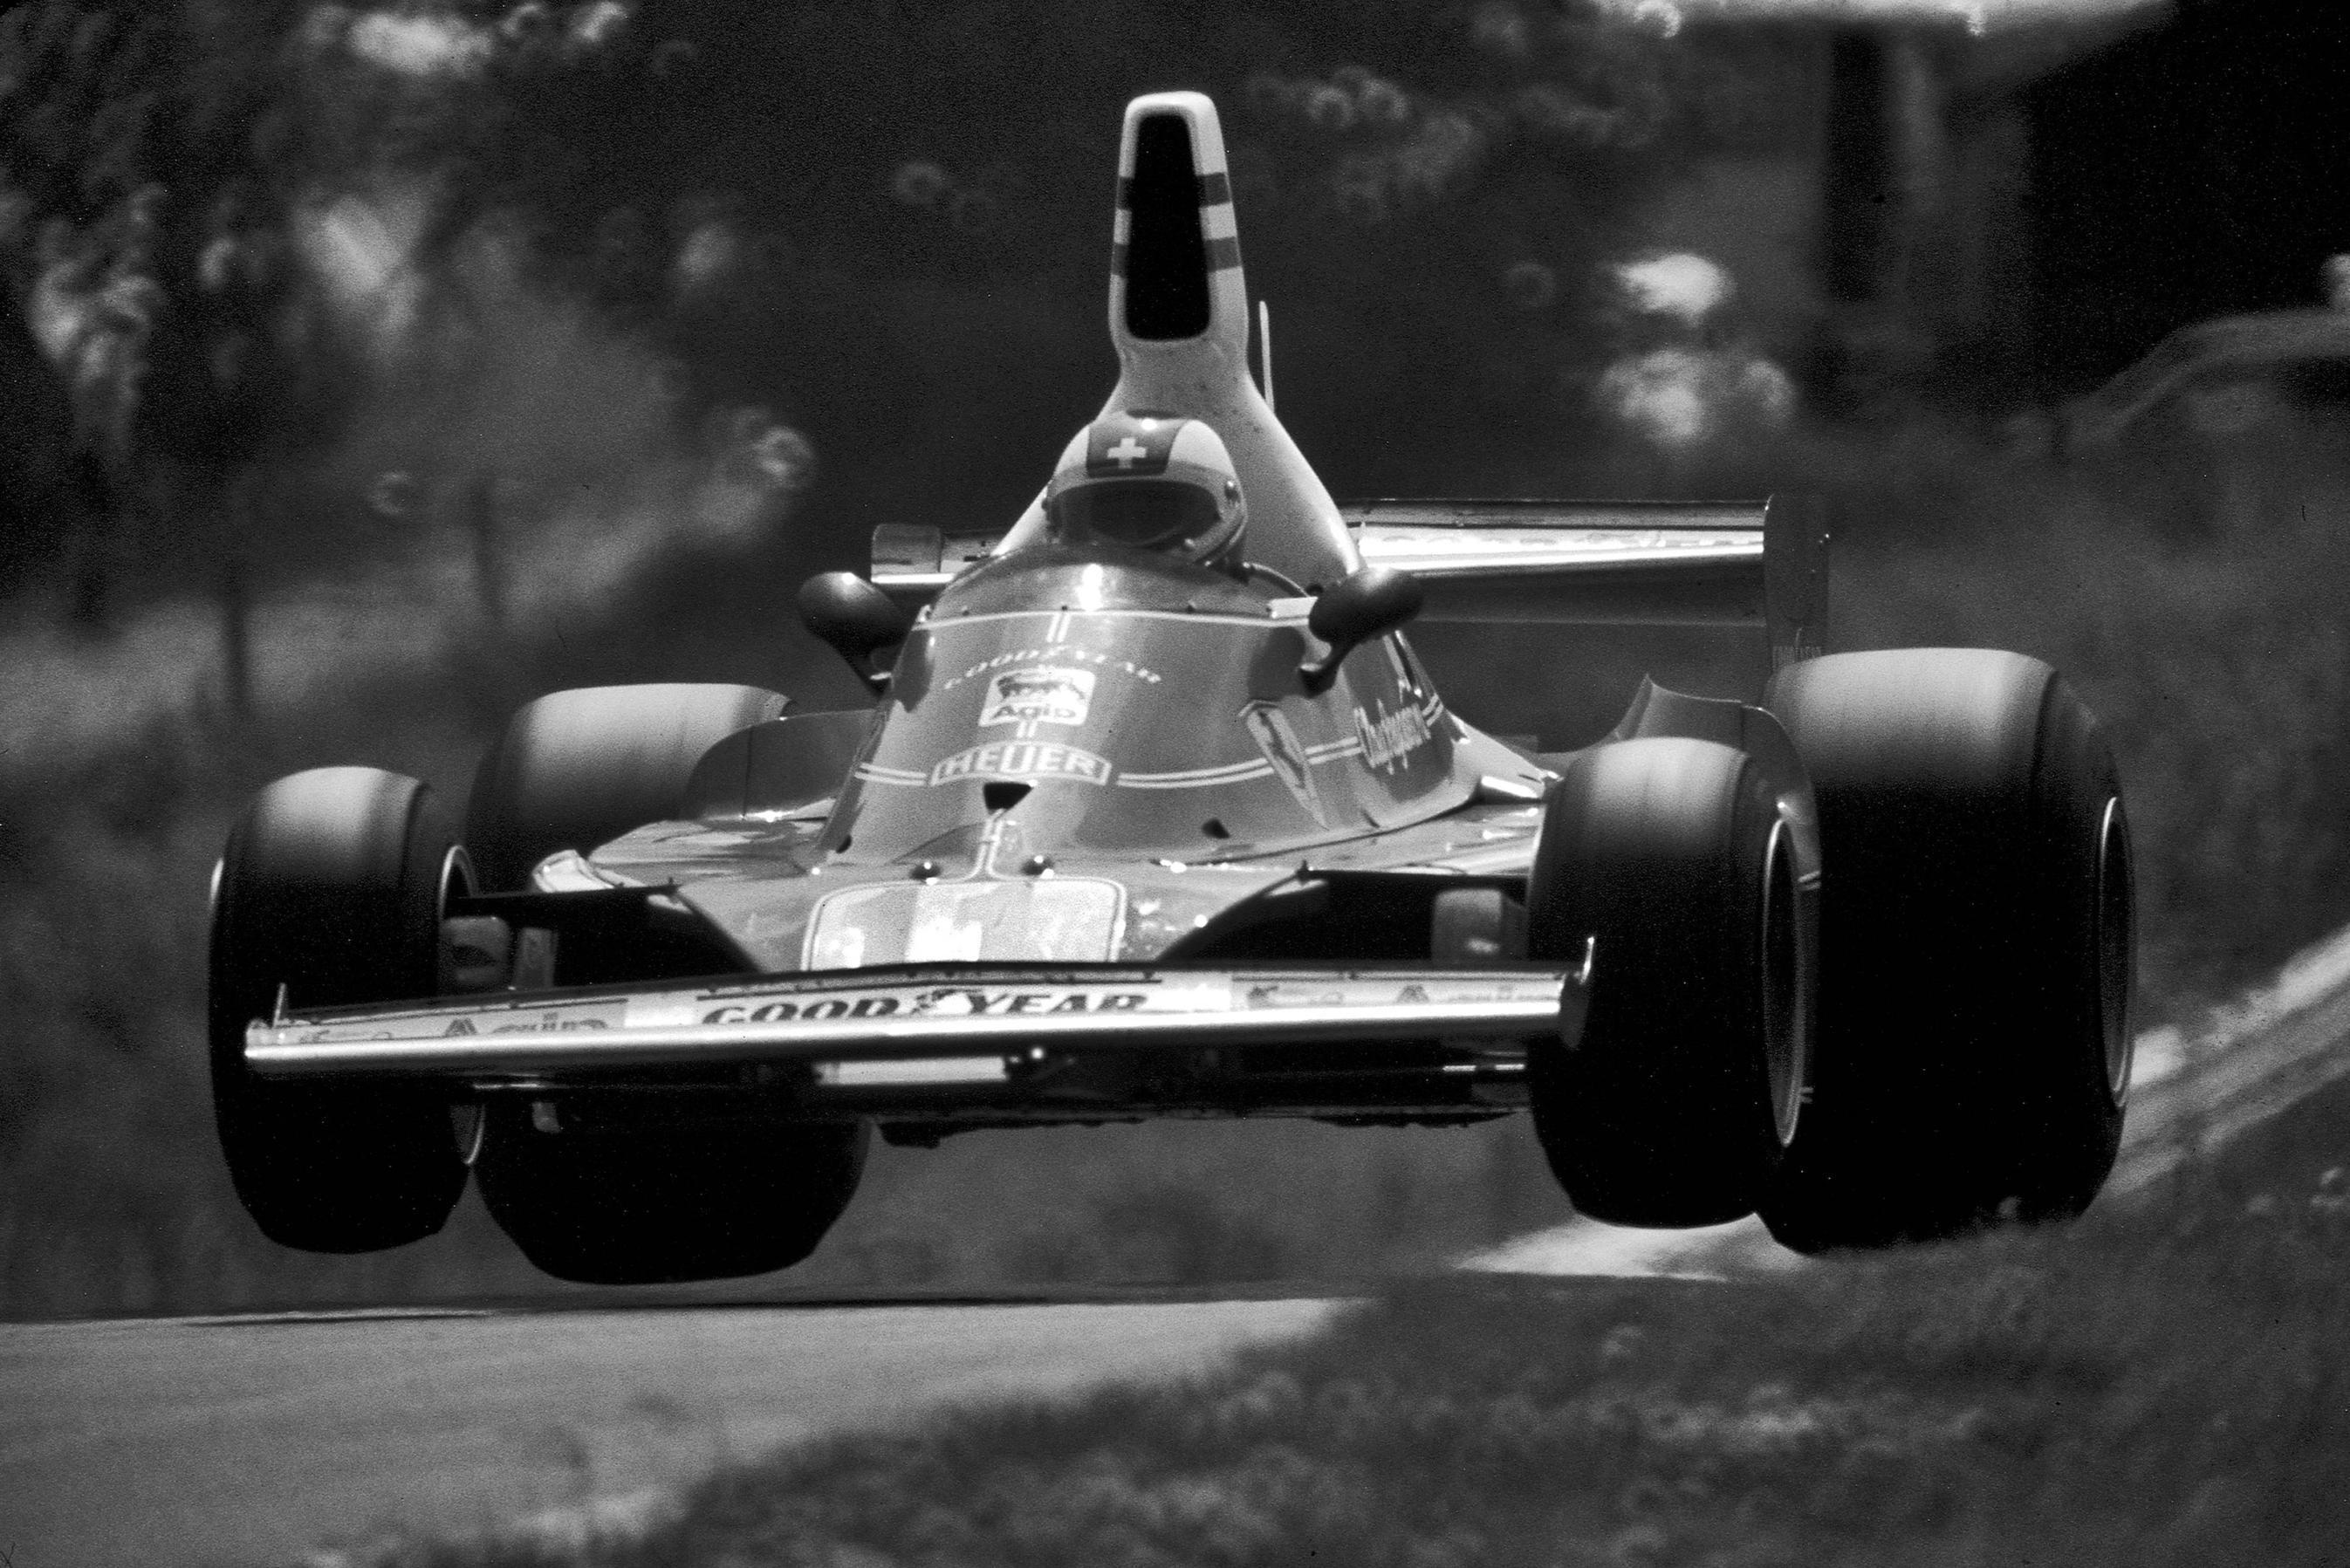 F1 1975 - Clay Regazzoni [2693x1797] - Imgur